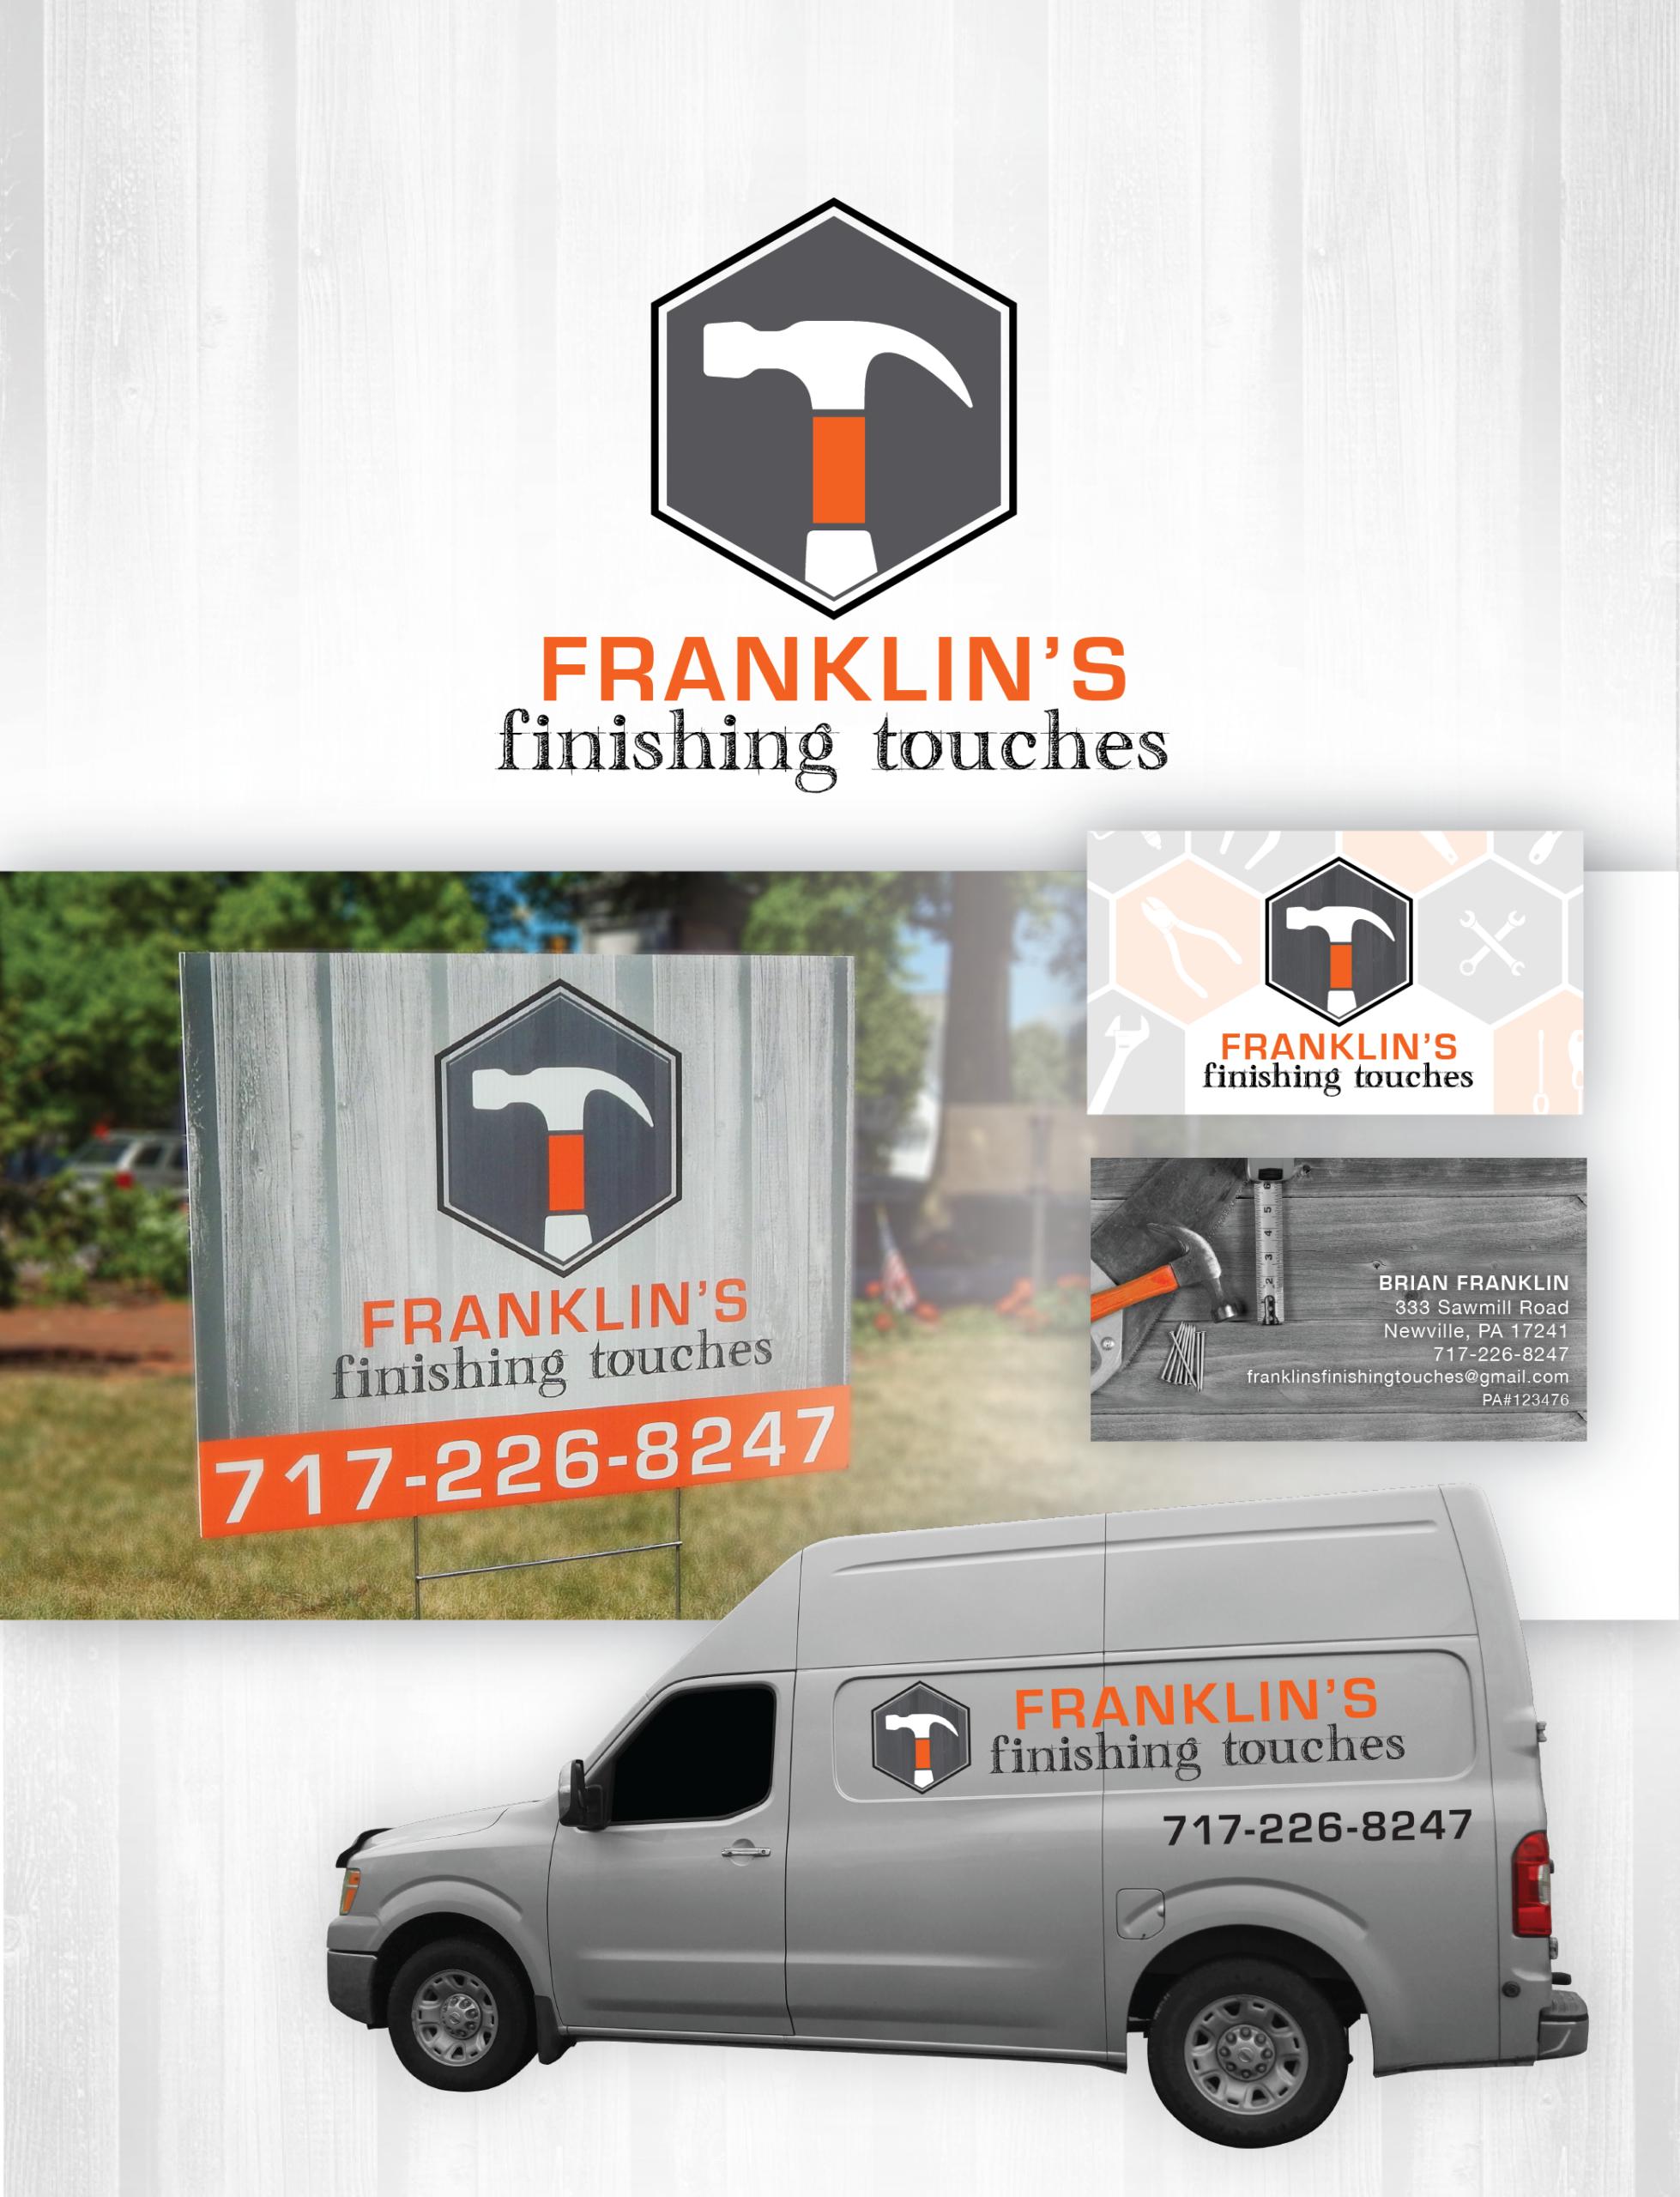 Franklin's Finishing Touches Portfolio